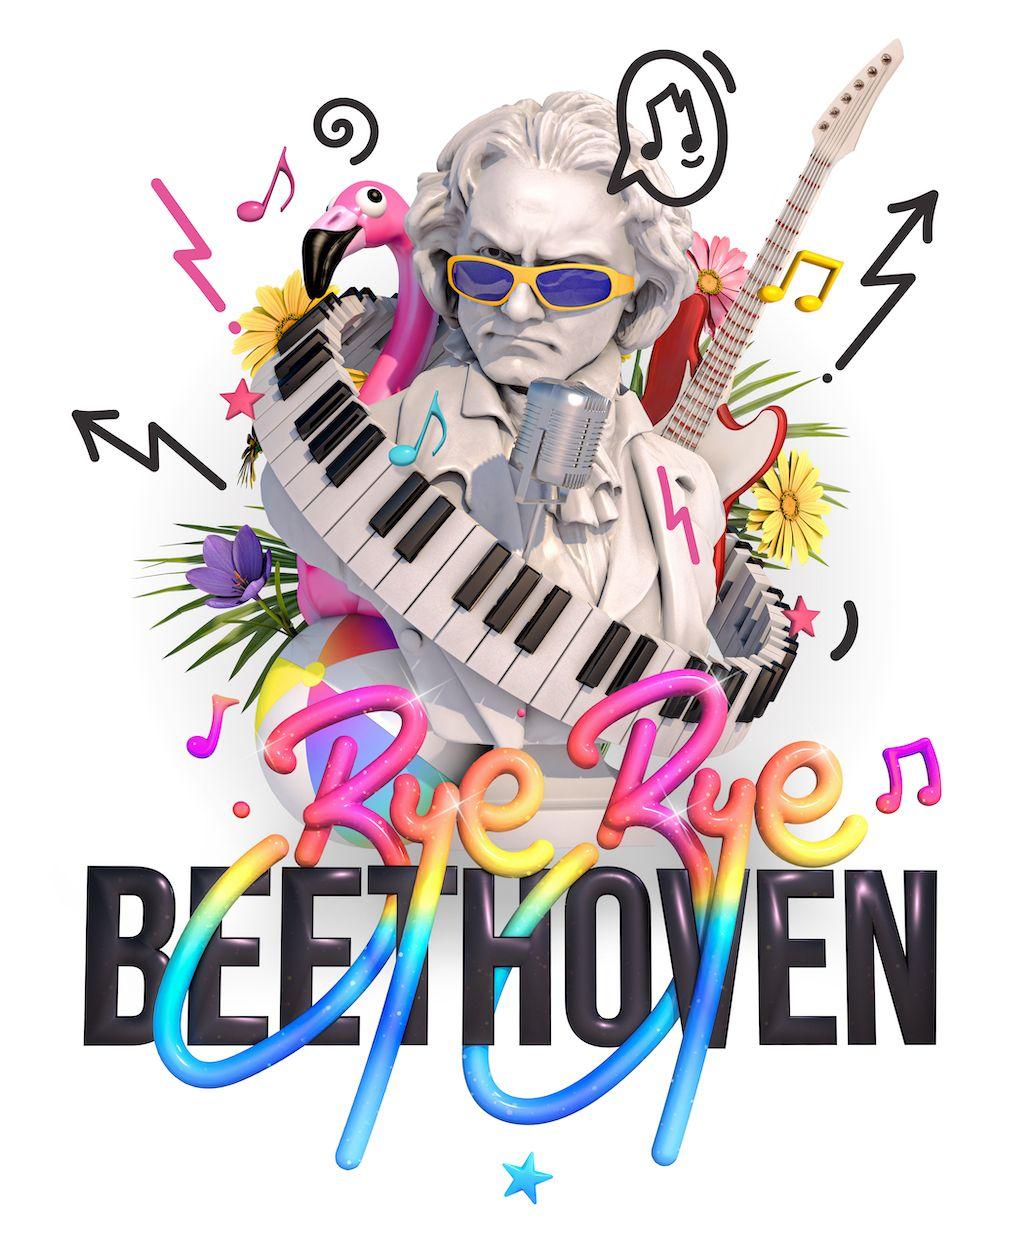 Campamento Musical Bye Bye Beethoven